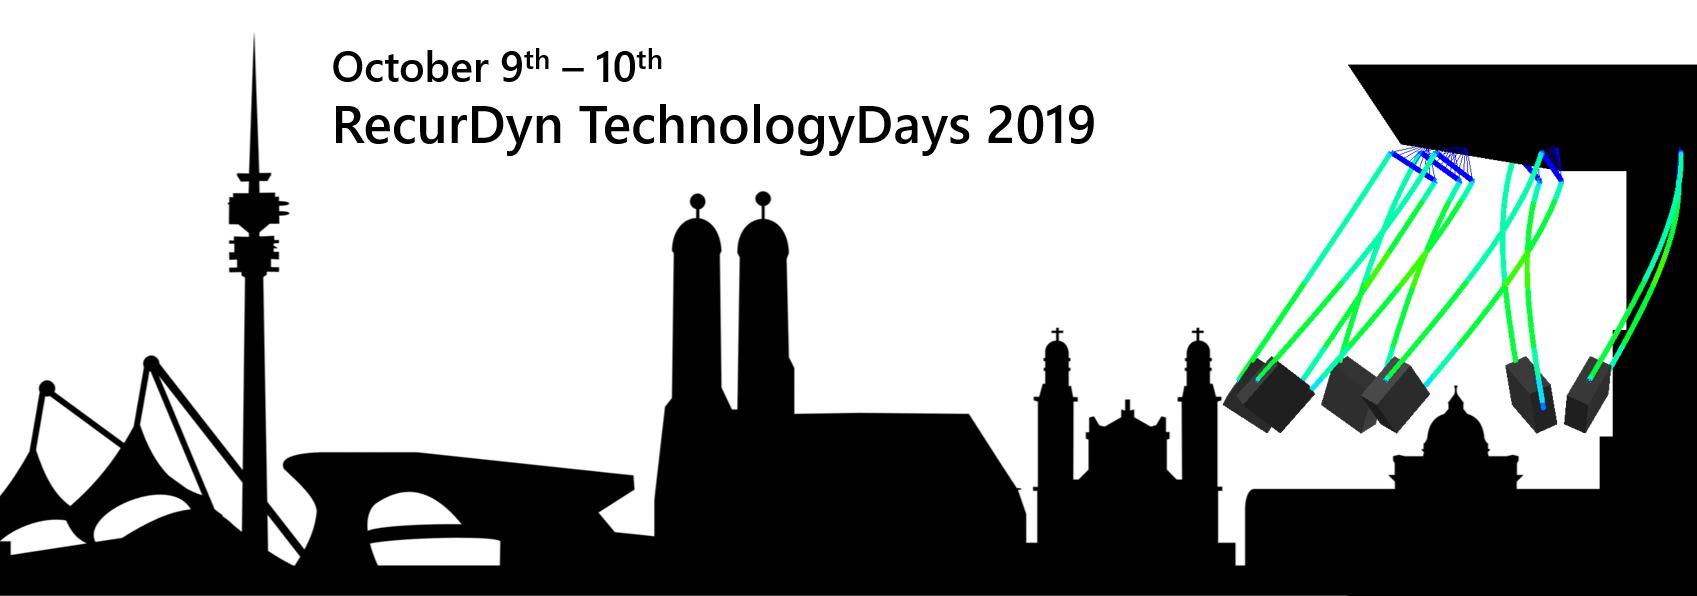 RecurDynTechnologyDays2019